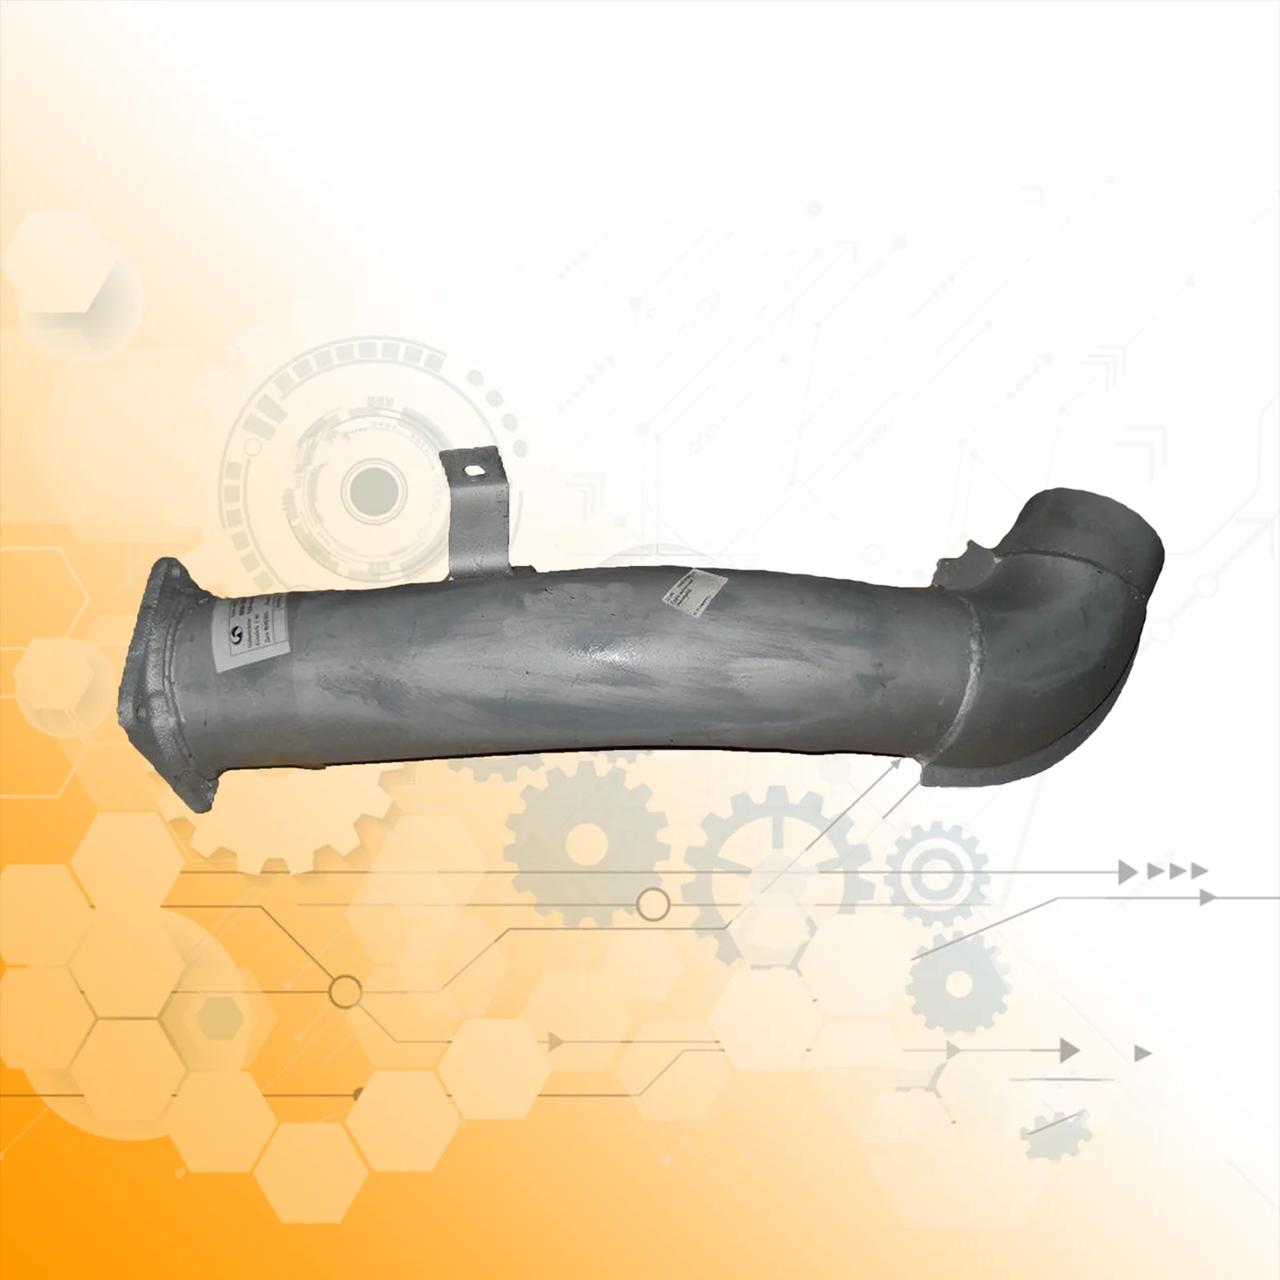 Труба выхлопная КрАЗ 65055-1203013-10